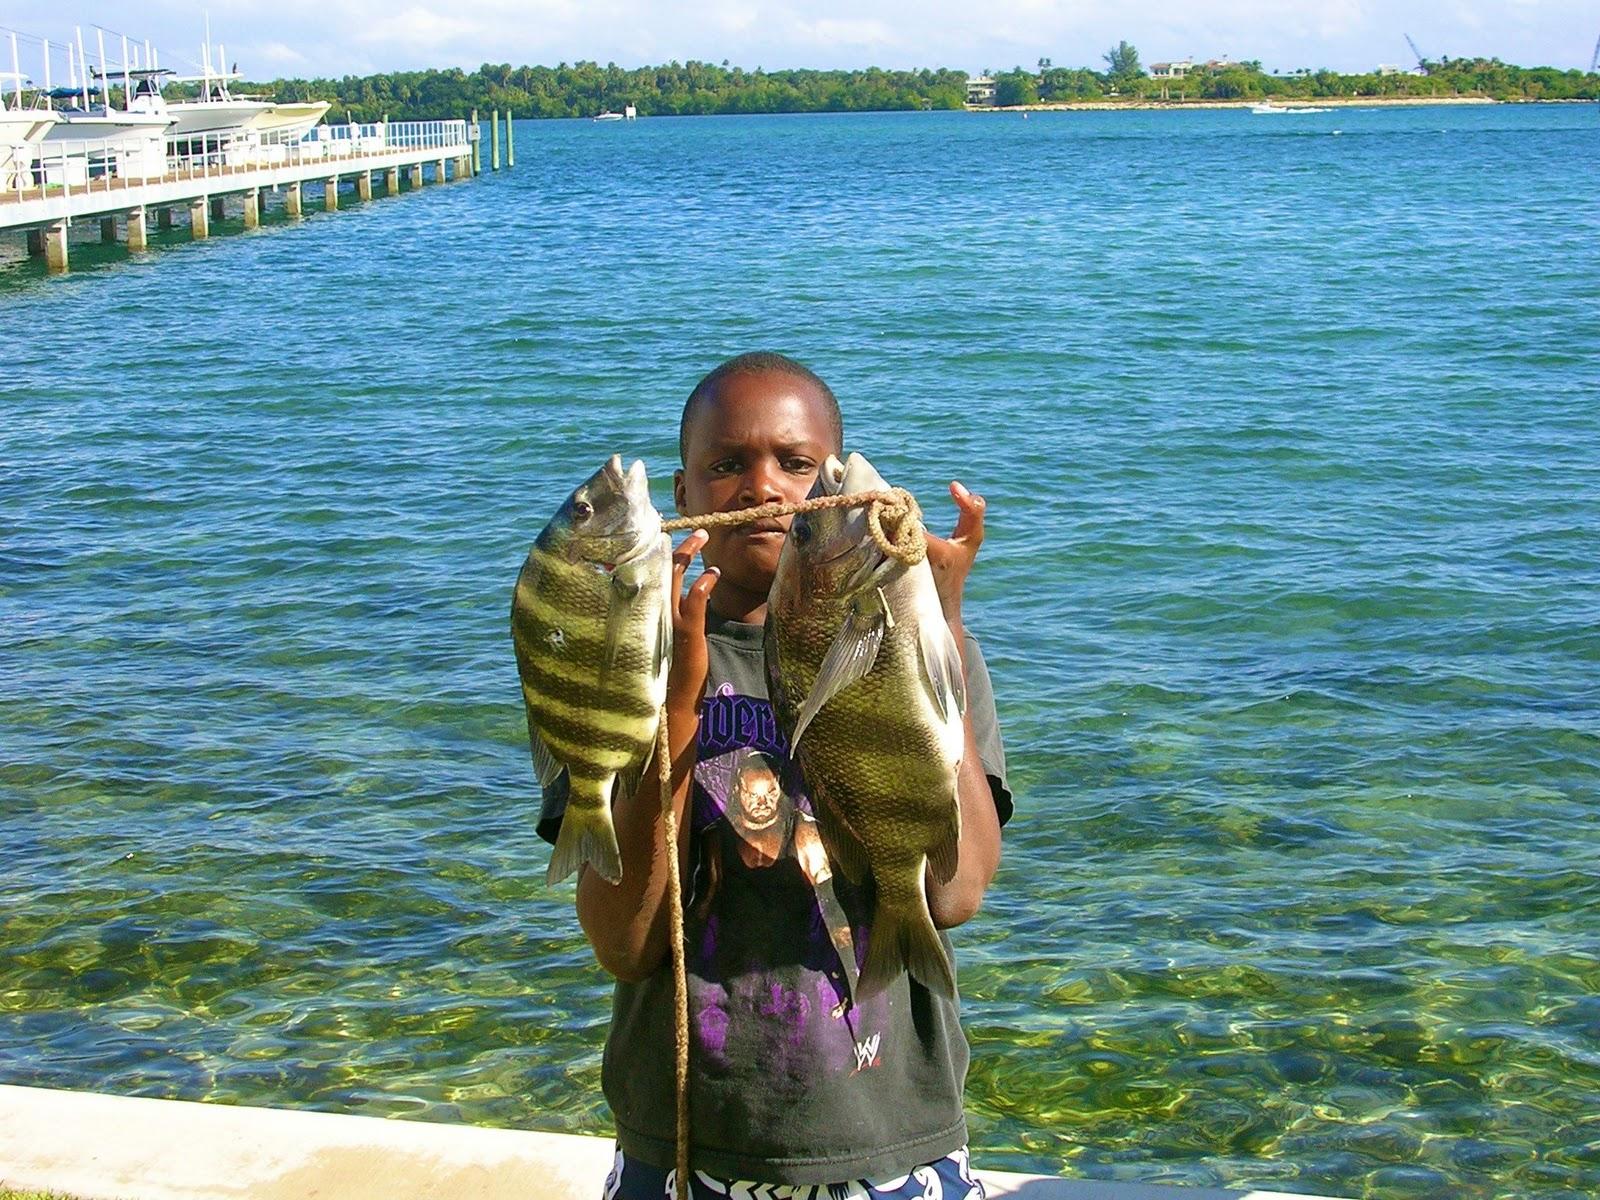 Florida fishing academy december 2010 for Delray beach fishing